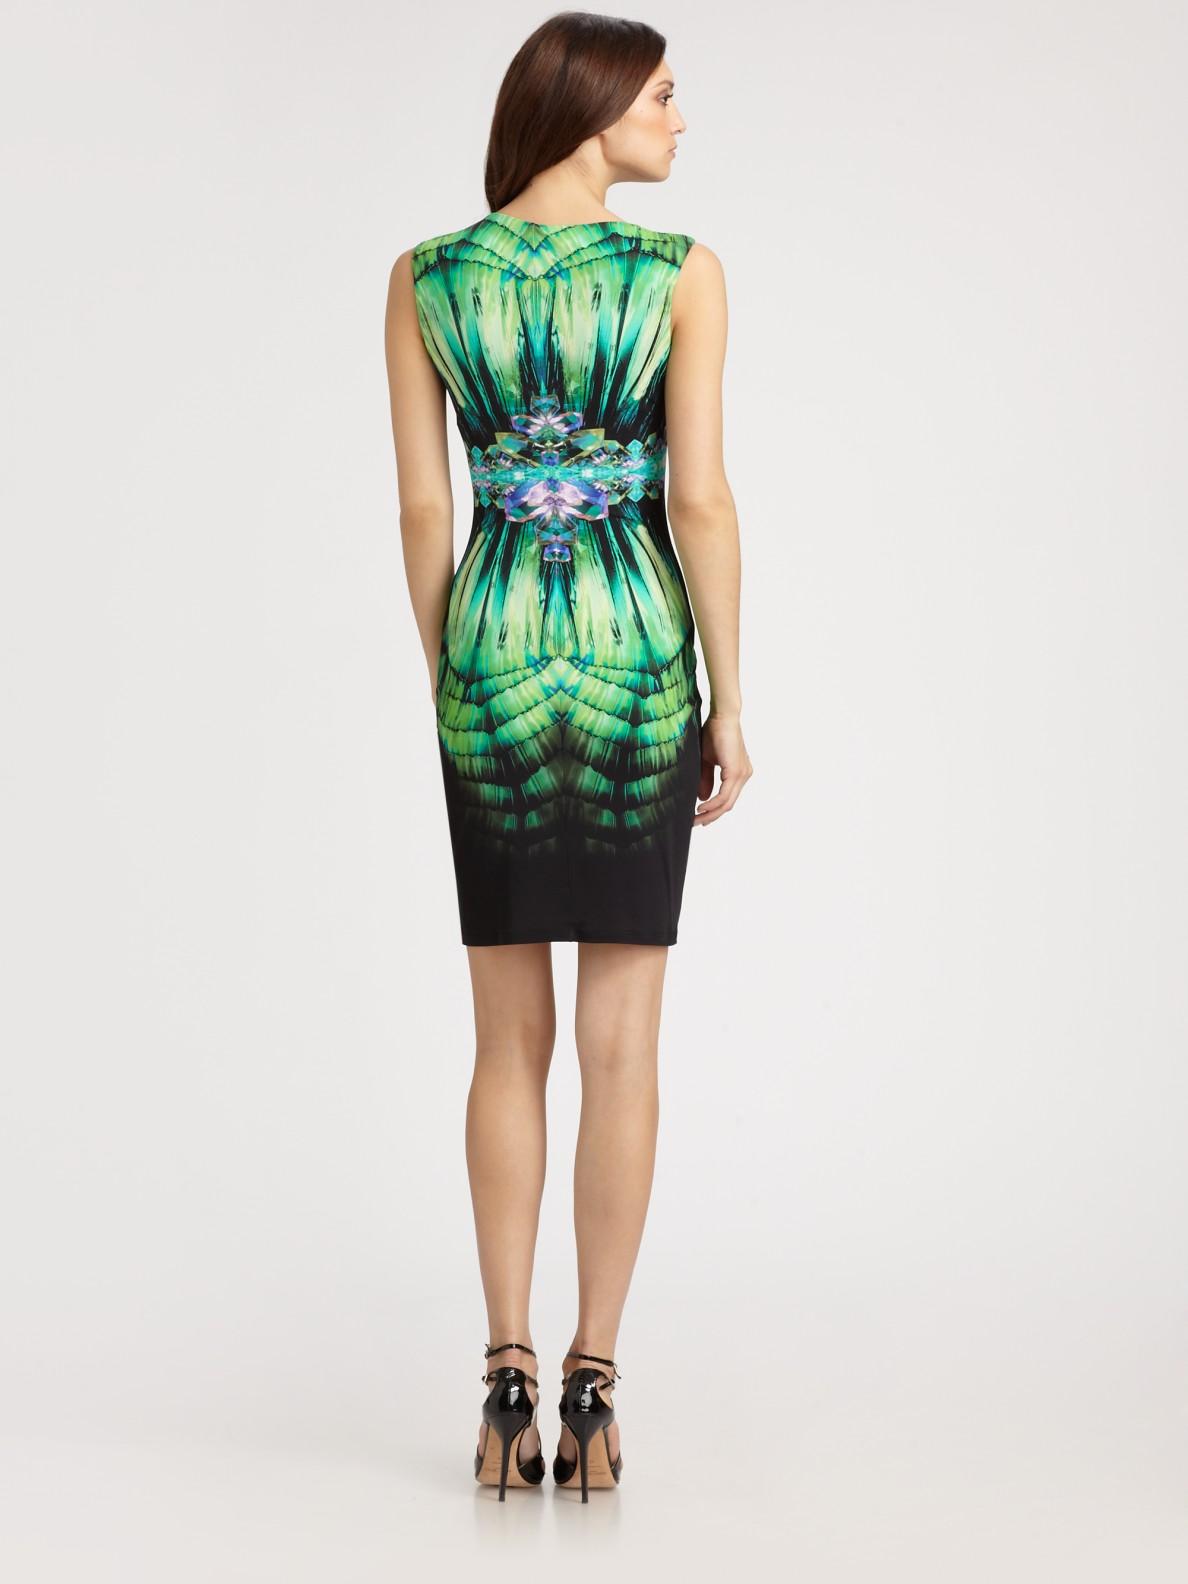 Lyst Roberto Cavalli Printed Dress In Green